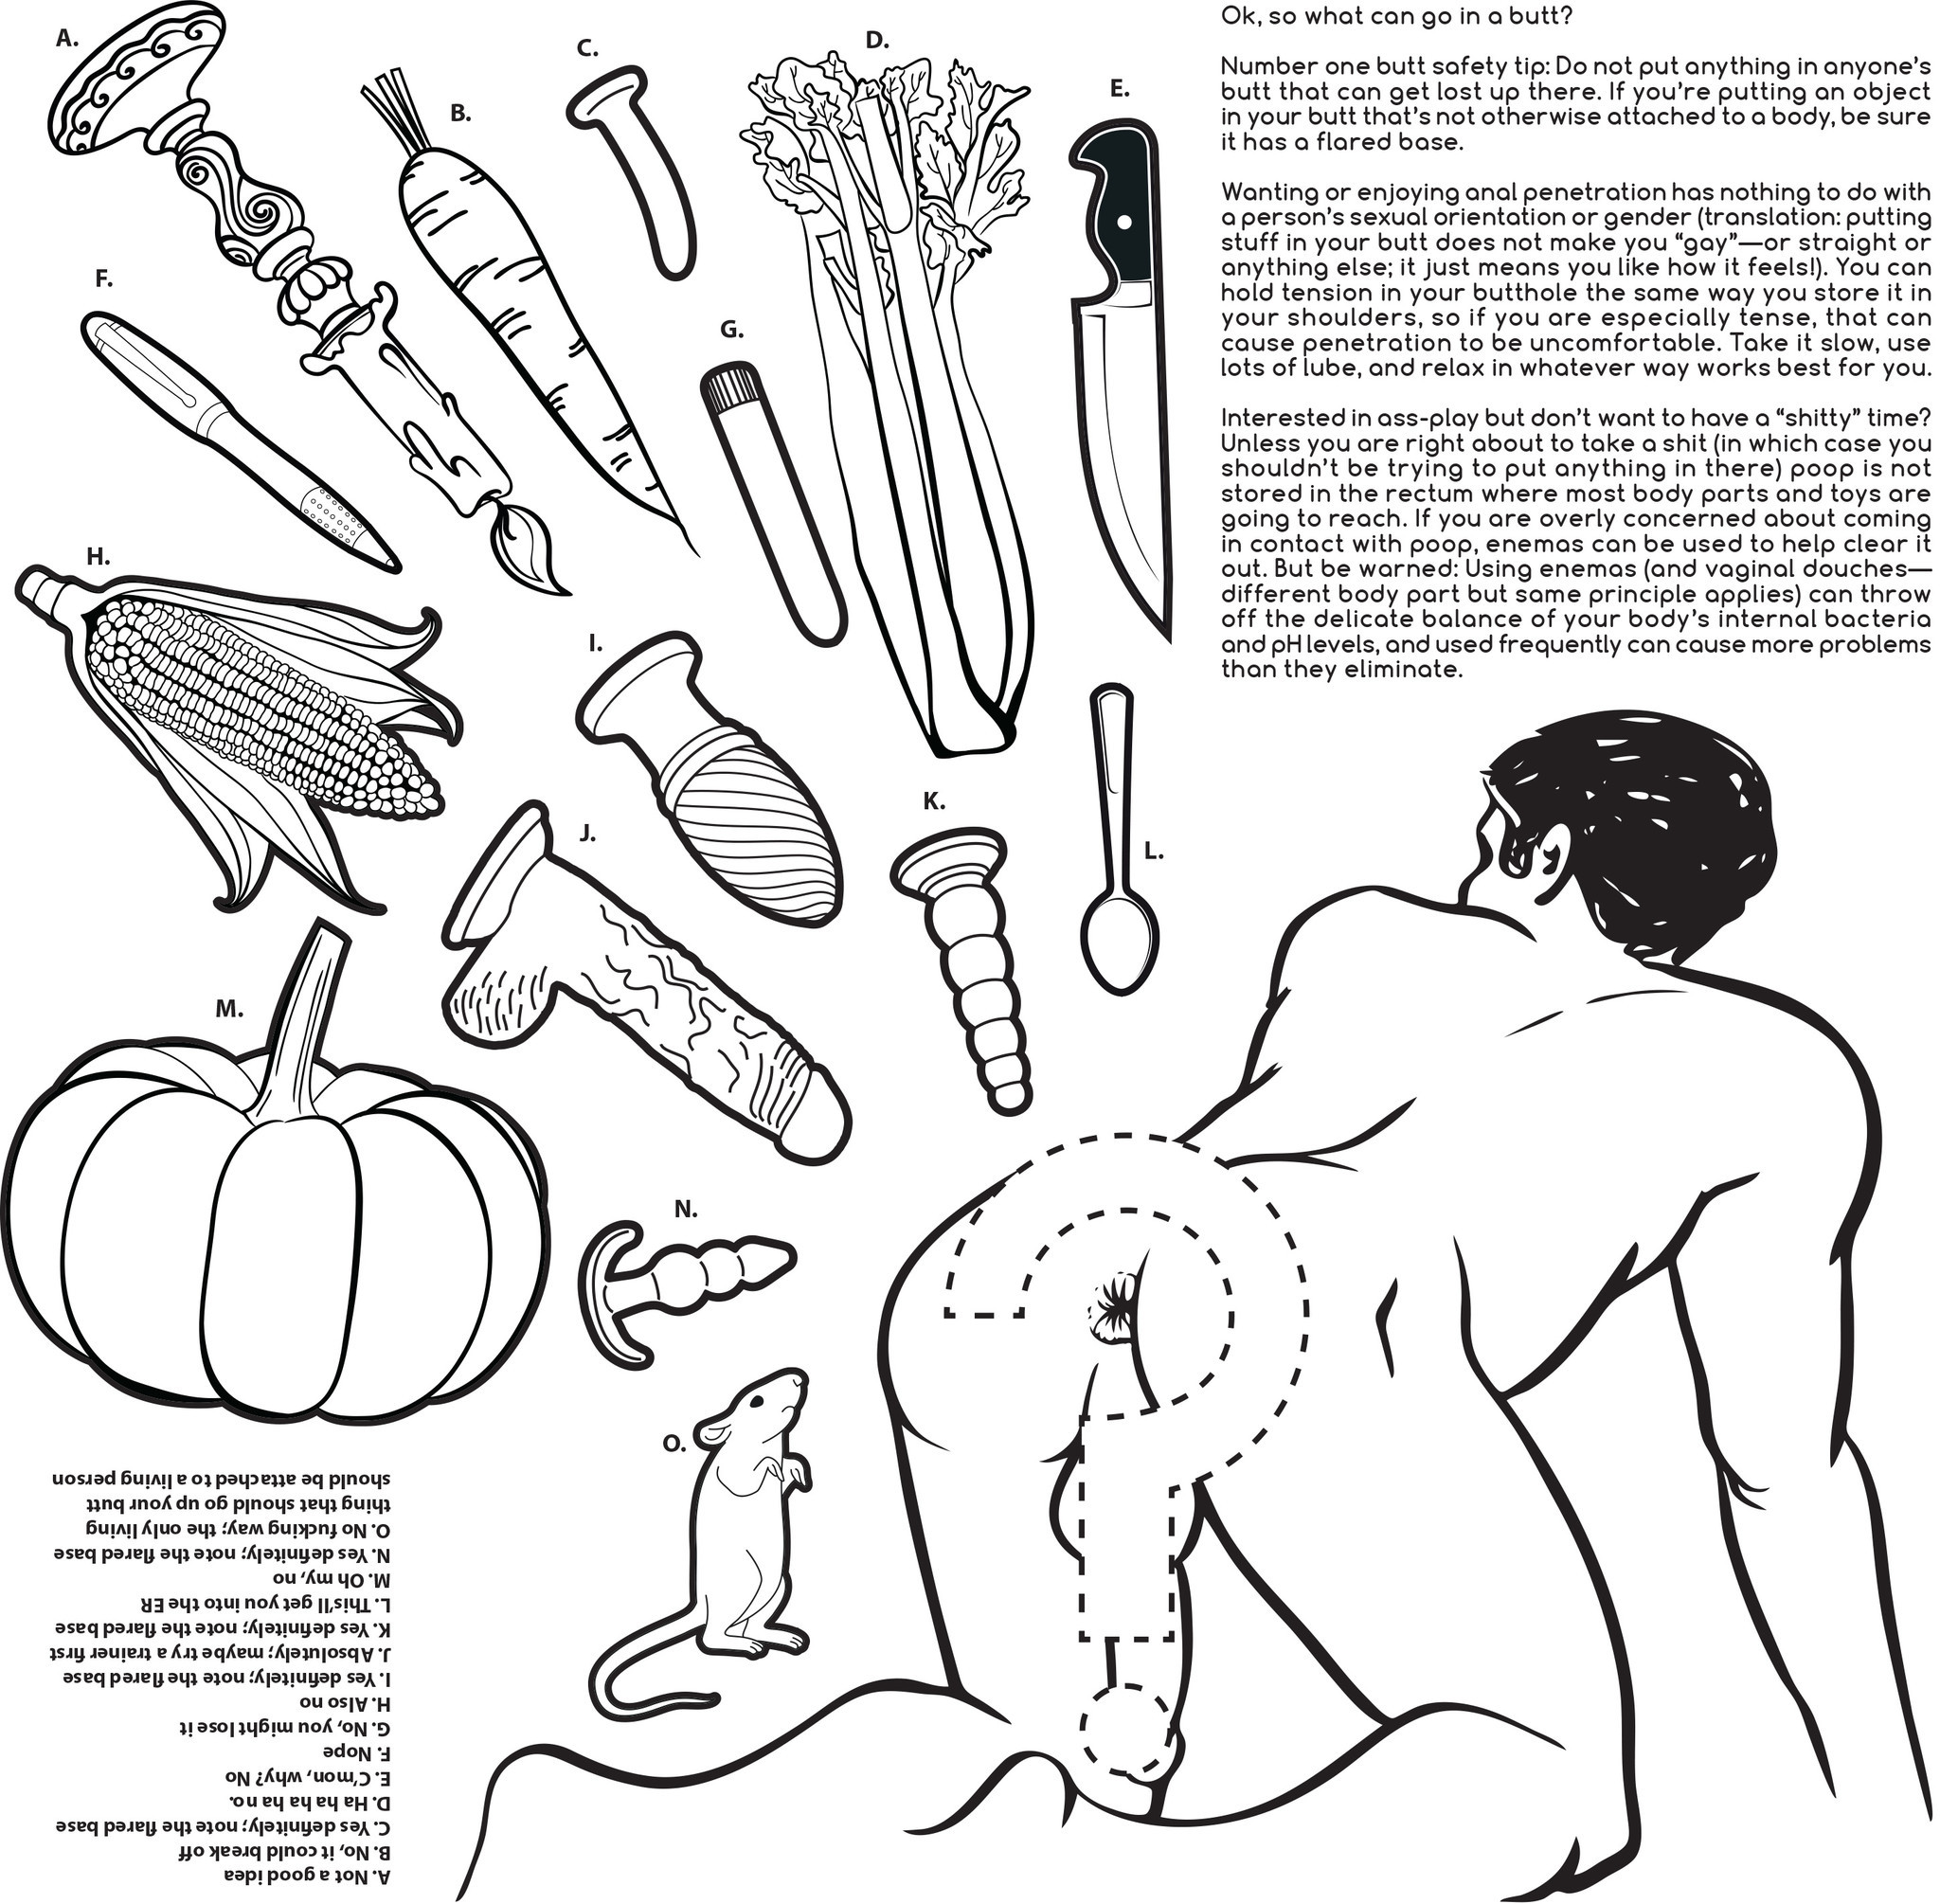 Sex positon pdf download opinion, the